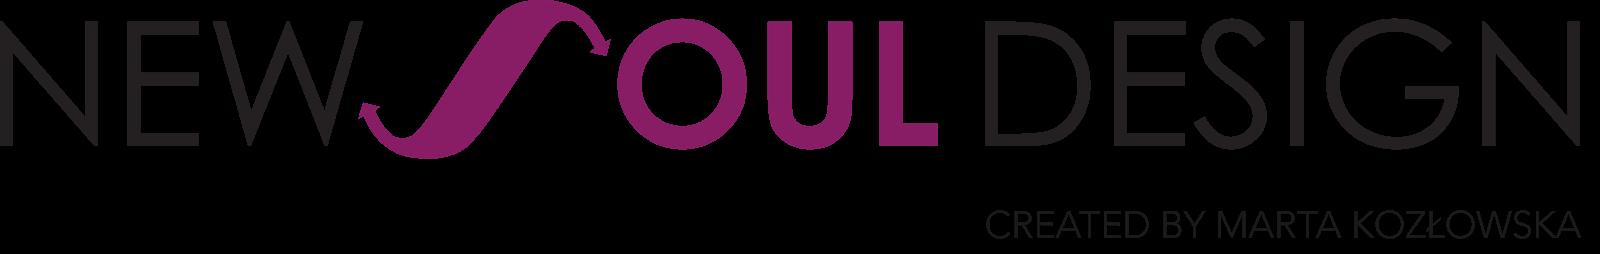 New Soul Design